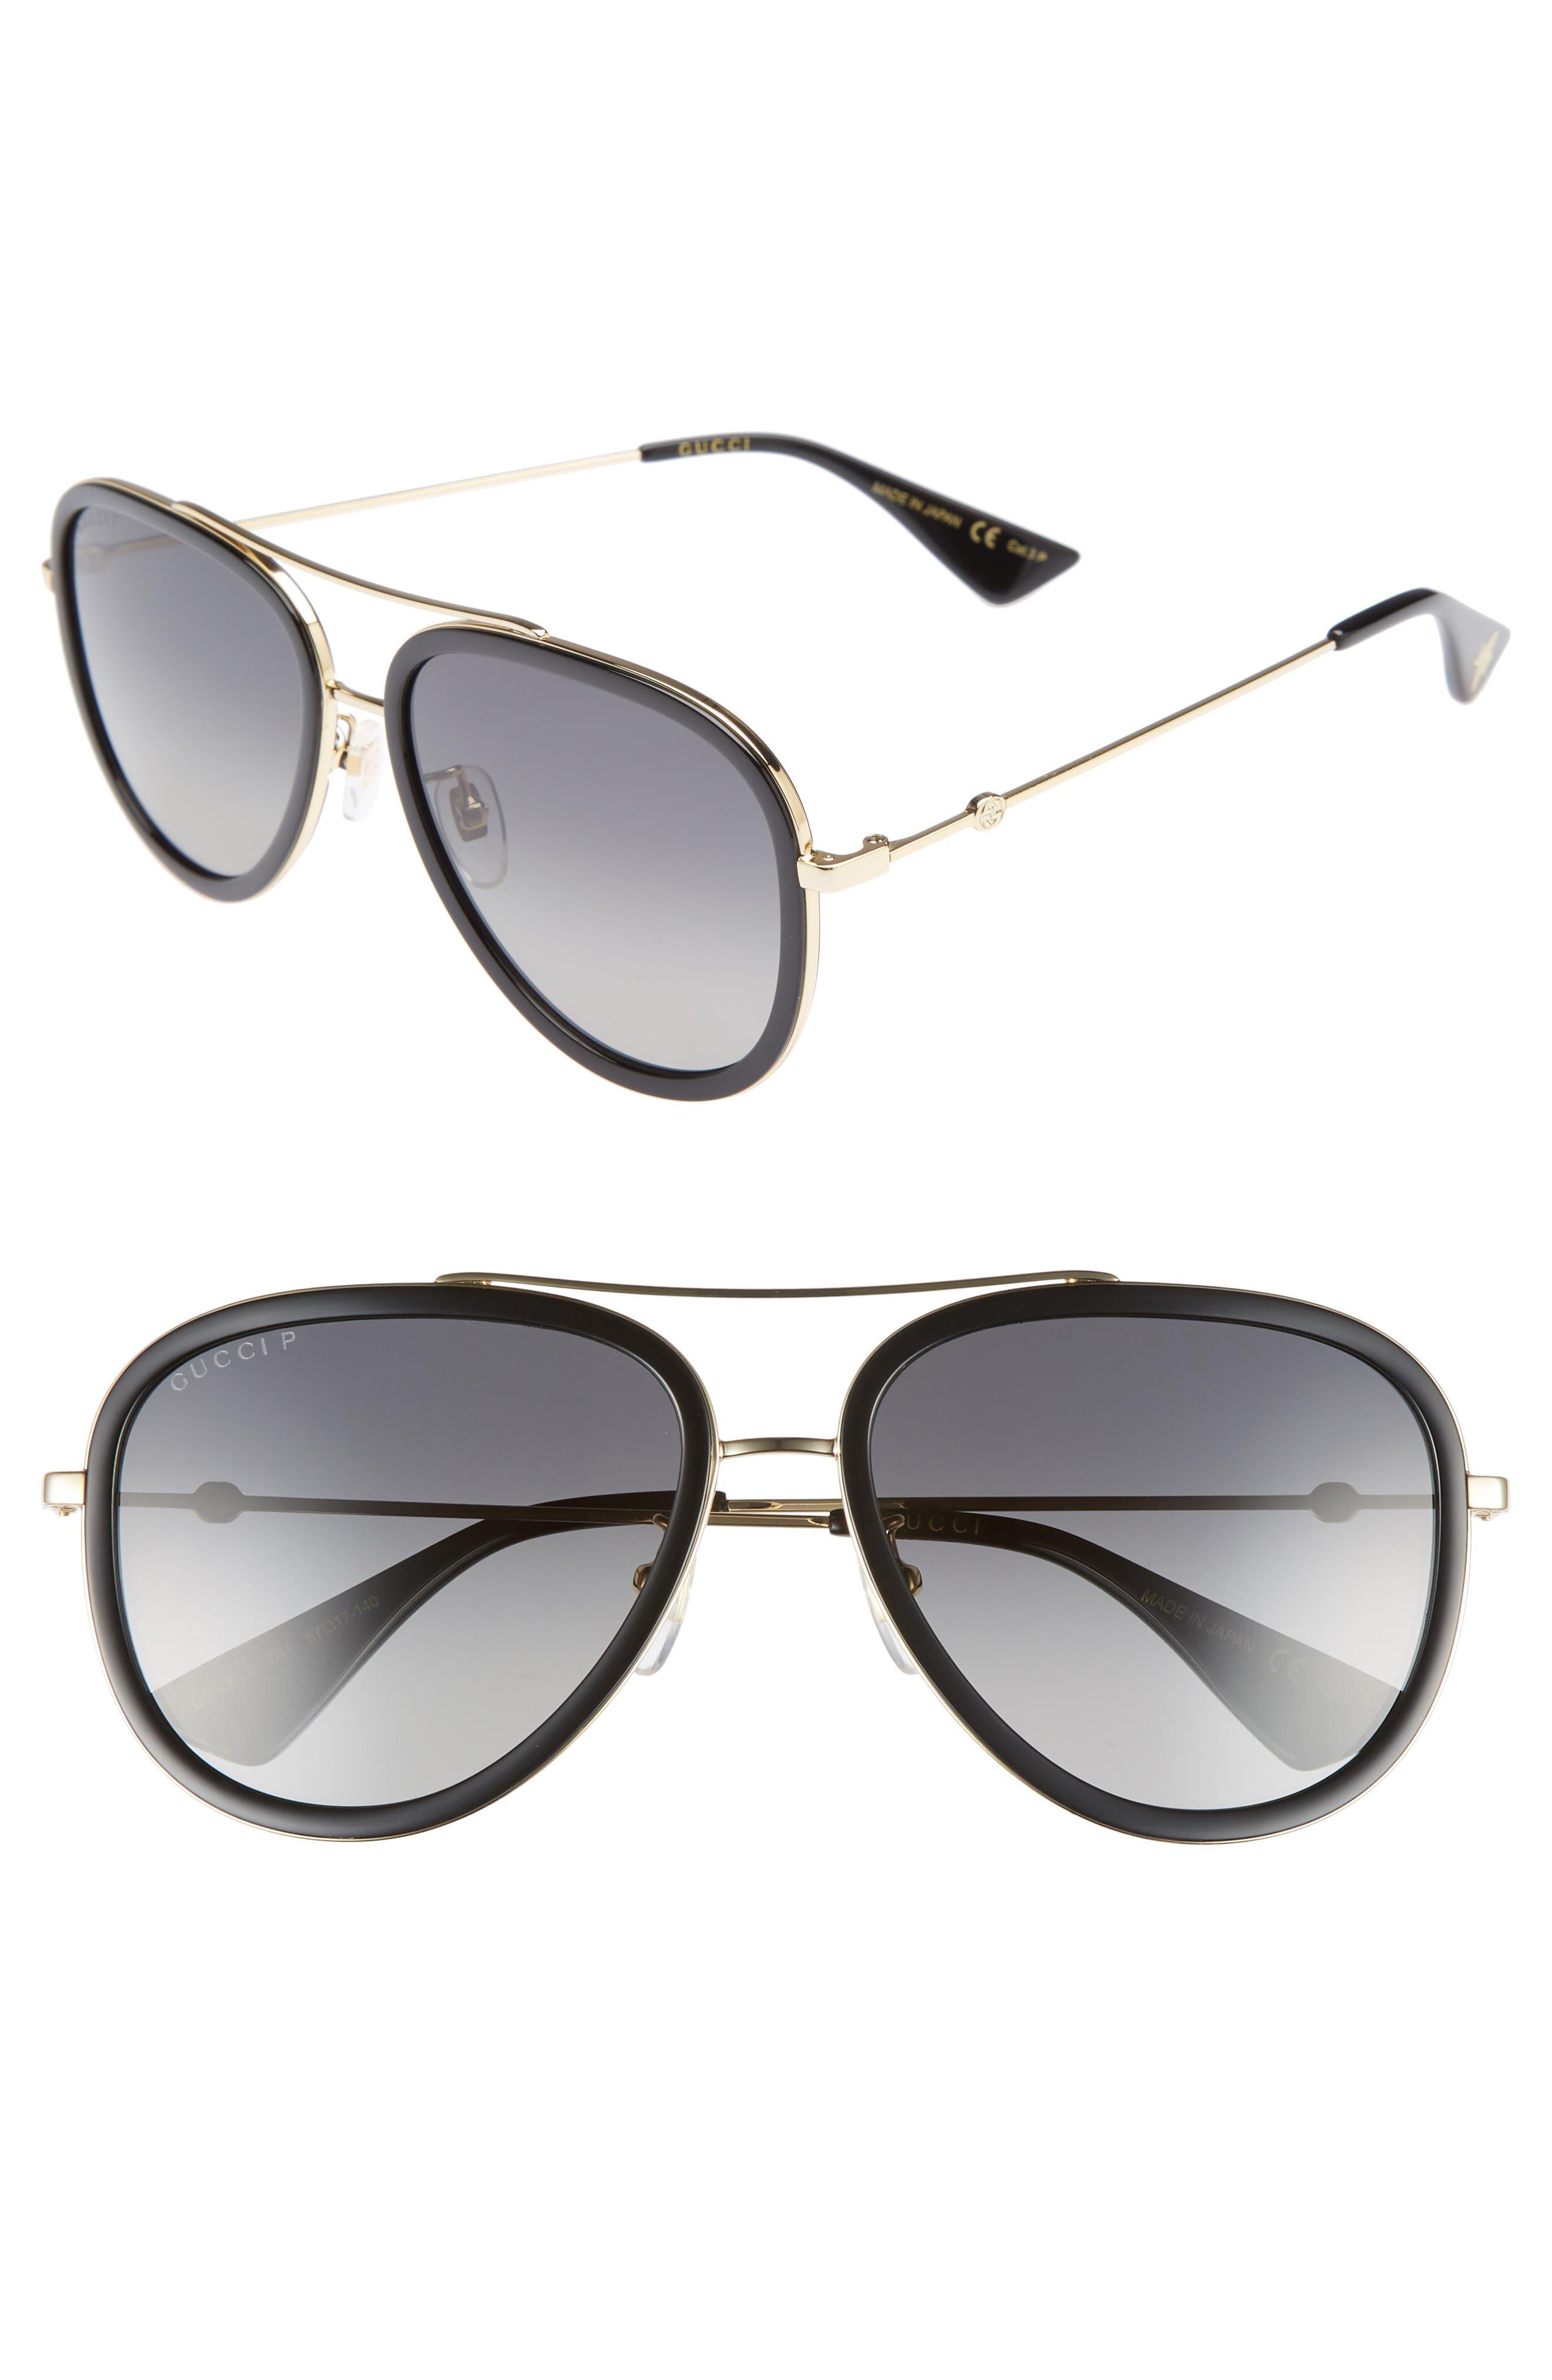 Gucci 57mm Polarized Metal Aviator Sunglasses